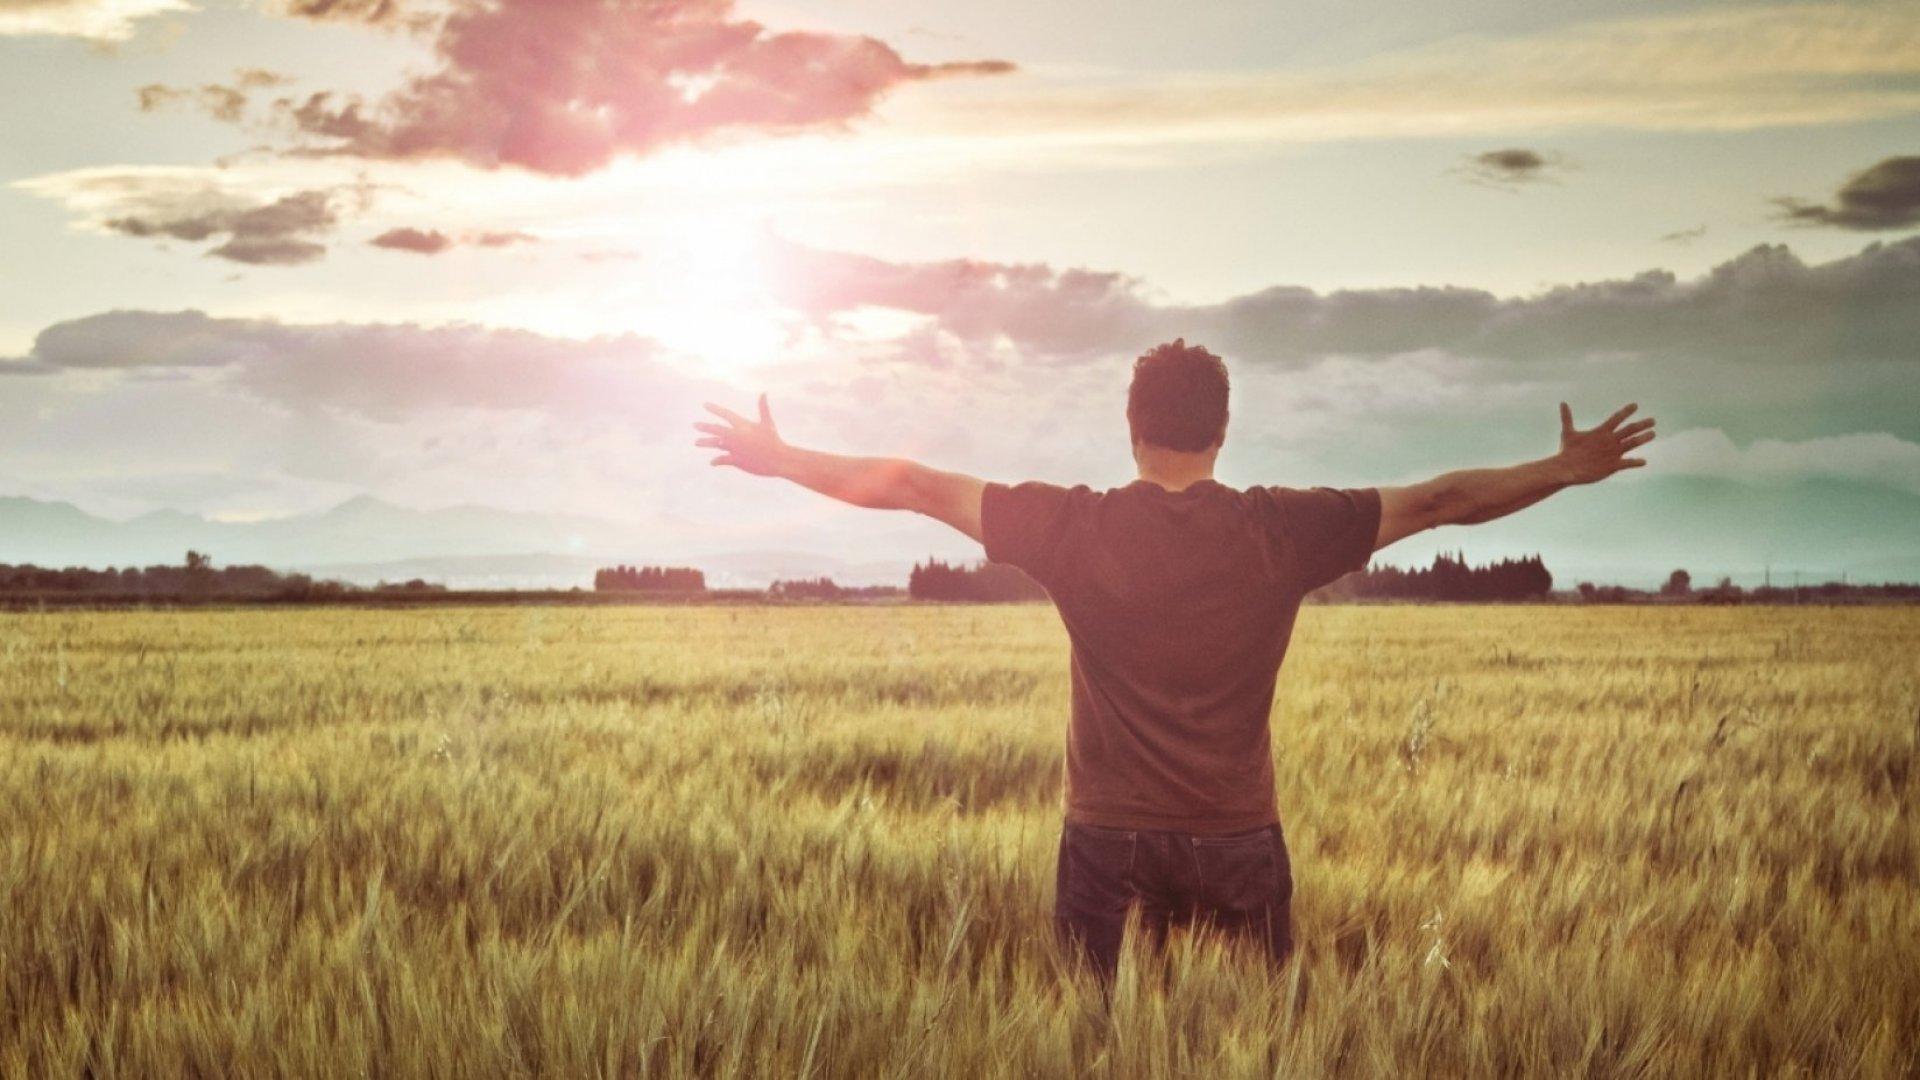 The Incredibly Short Mantra Entrepreneurs Should Say Every Morning